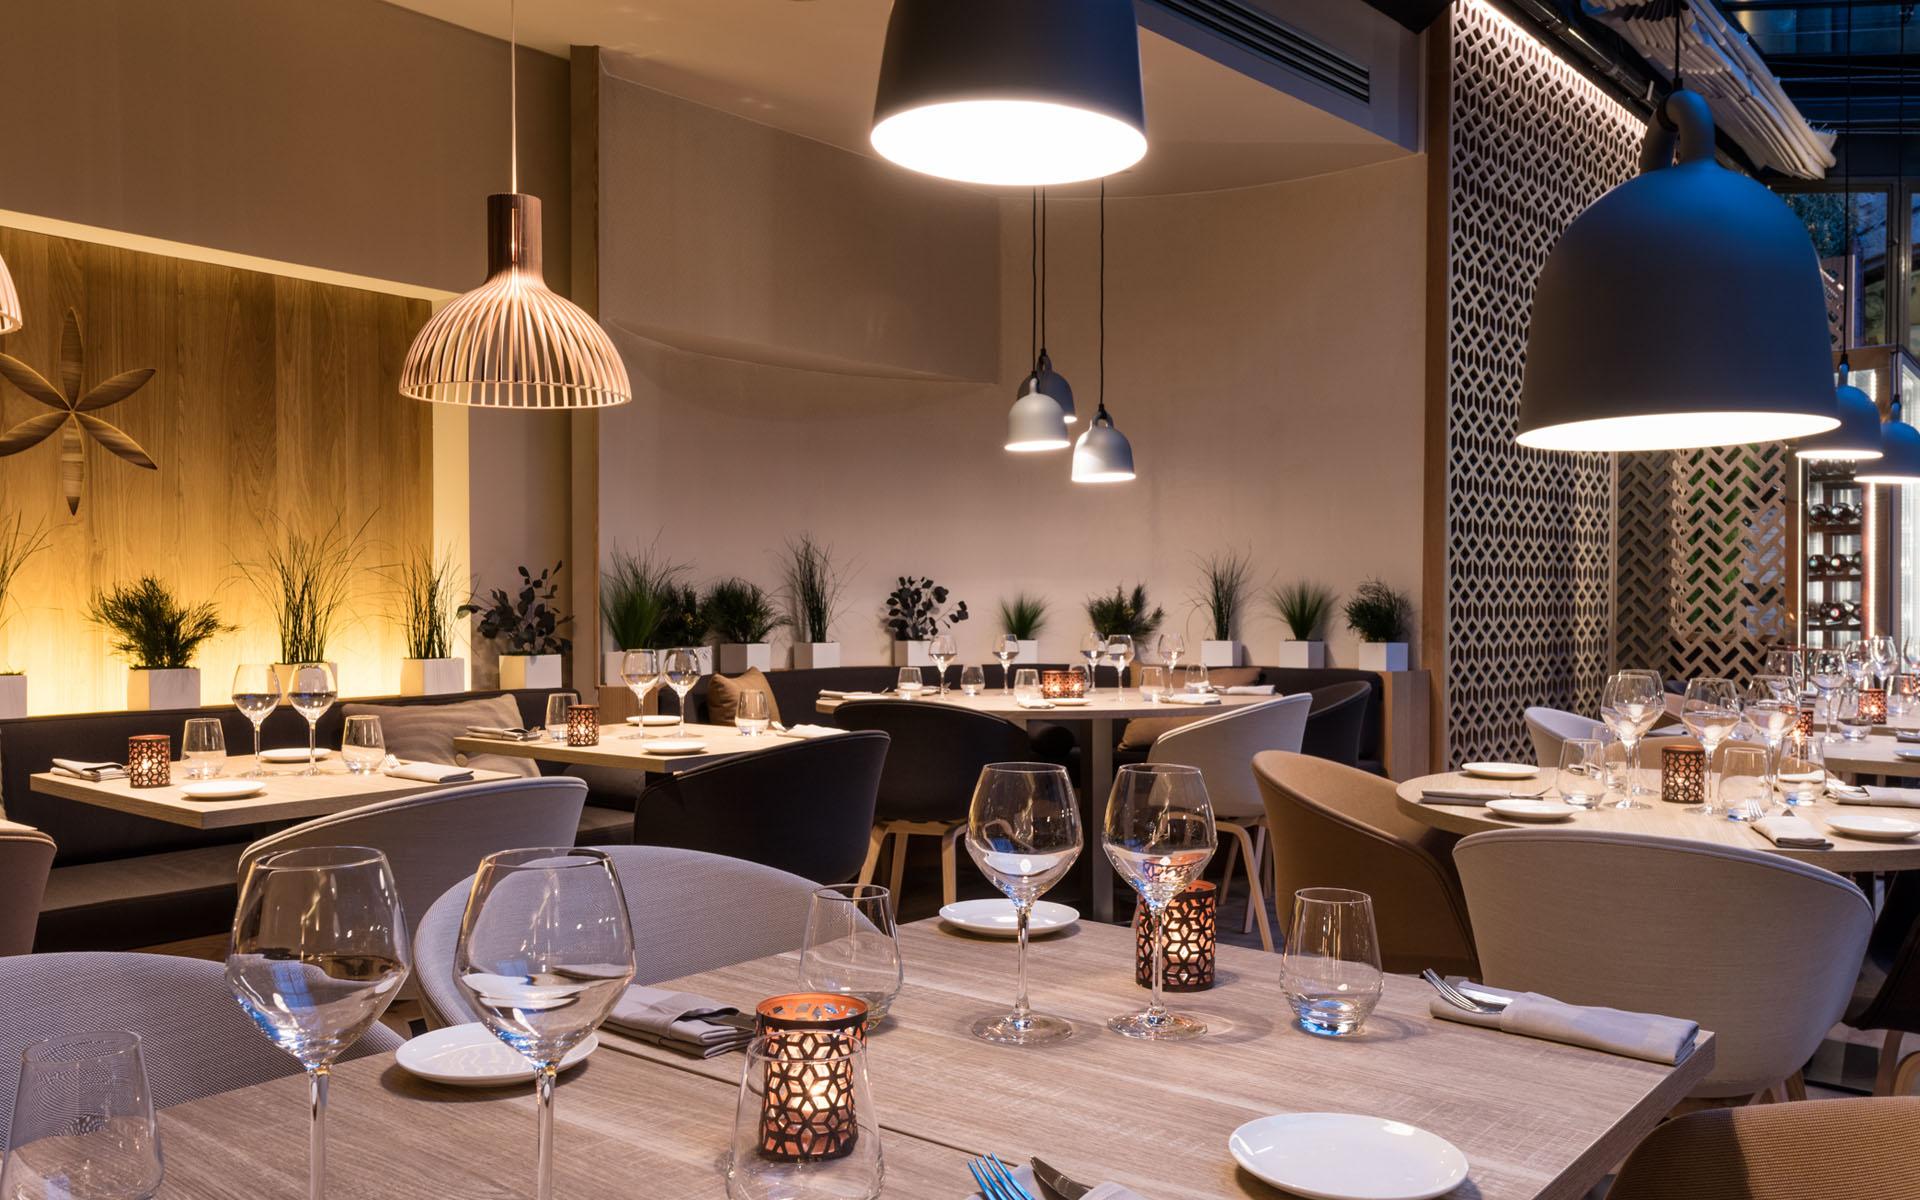 Restaurant c t cour aix en provence red banana studio for Ou bien manger a aix en provence